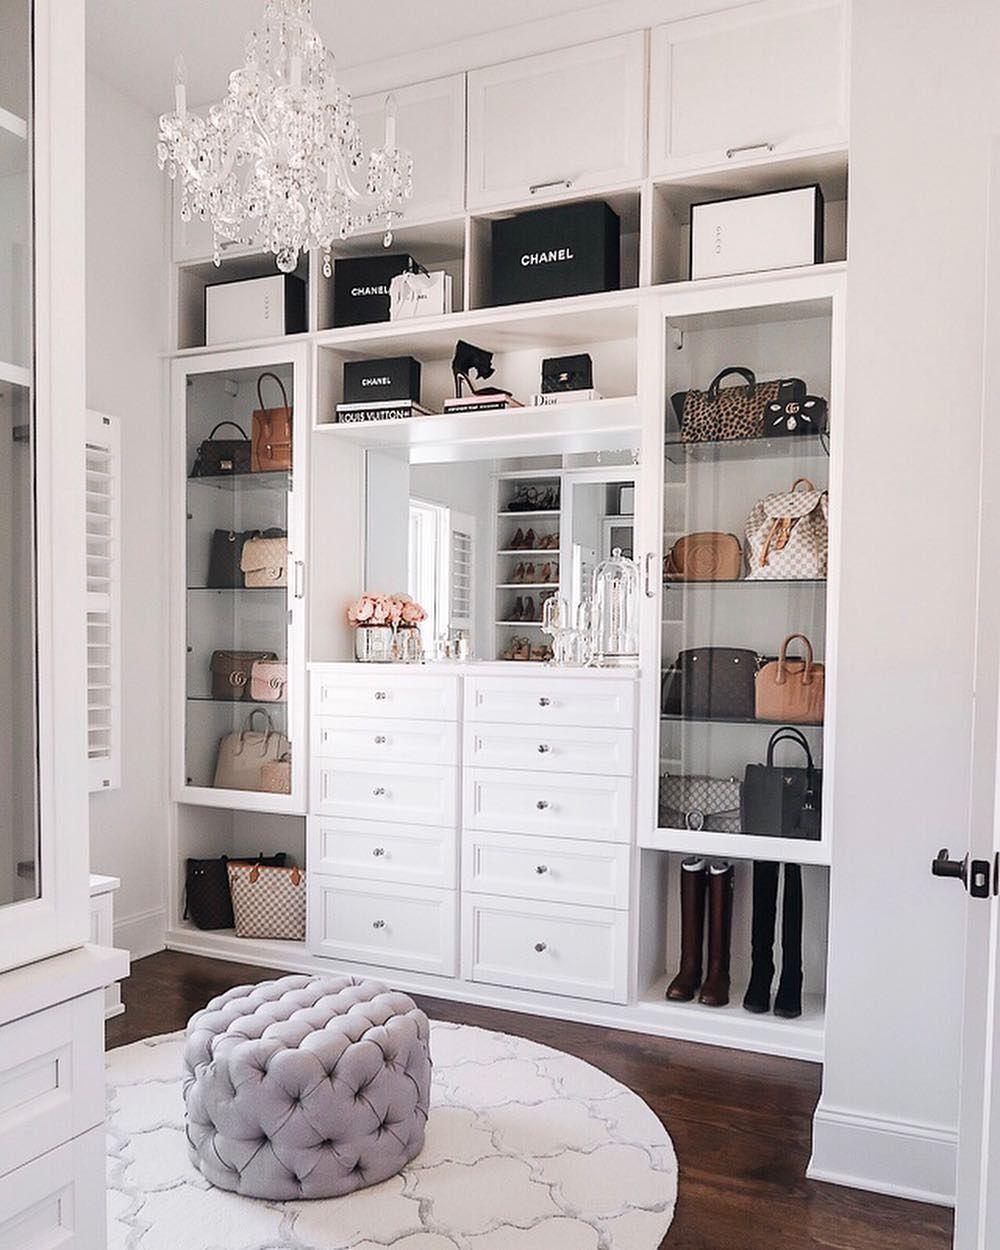 Caitlin Covington On Instagram New Igtv Video My Closet Tour I M Taking You Into My Closet Showing Closet Decor Closet Renovation Master Bedroom Closet